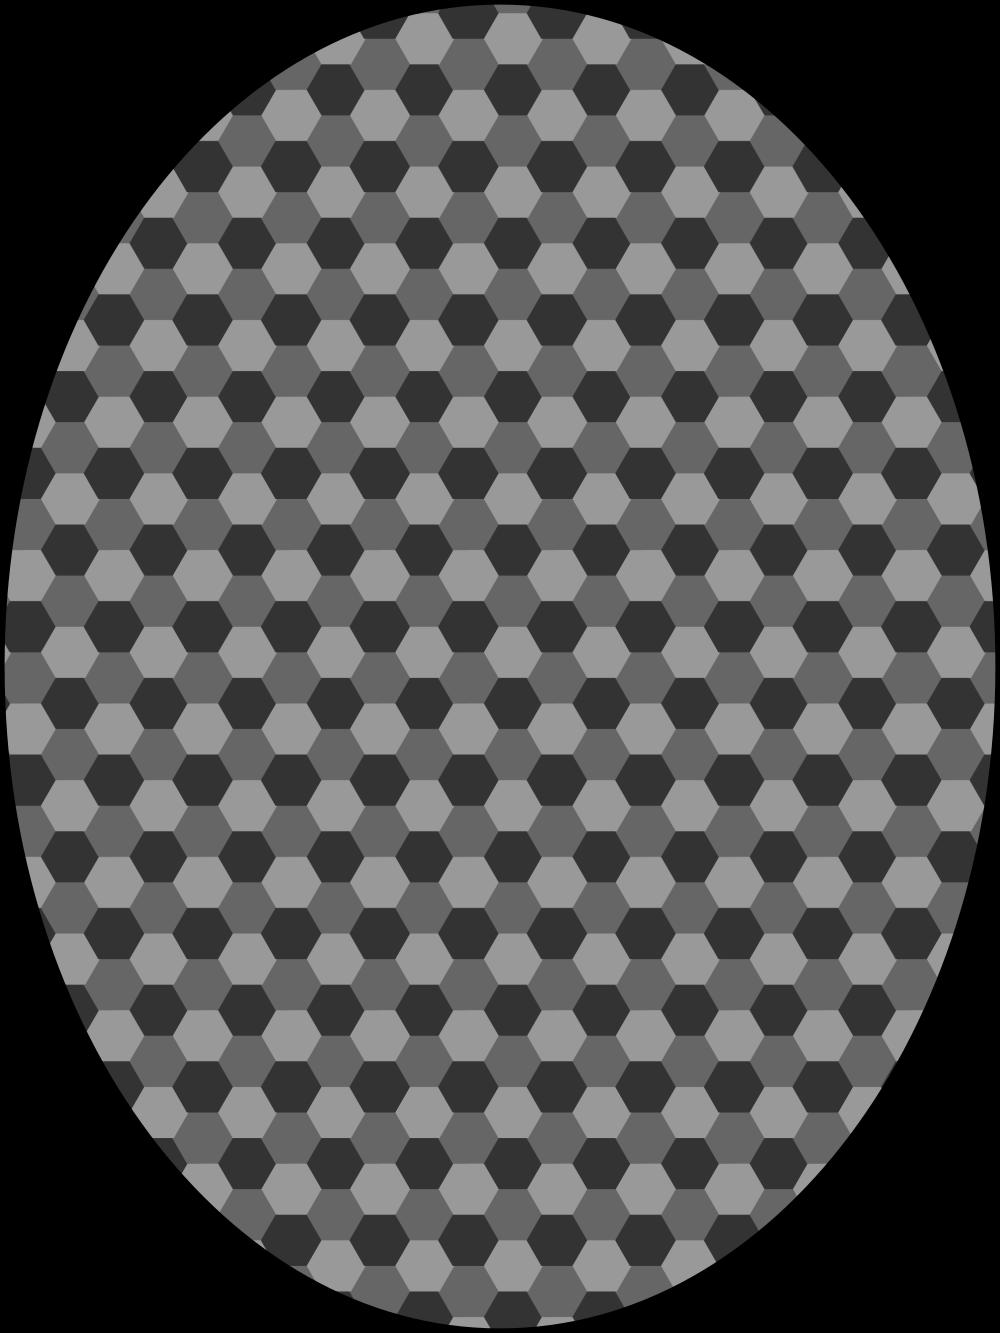 Honeycomb clipart geometric. Onlinelabels clip art pattern